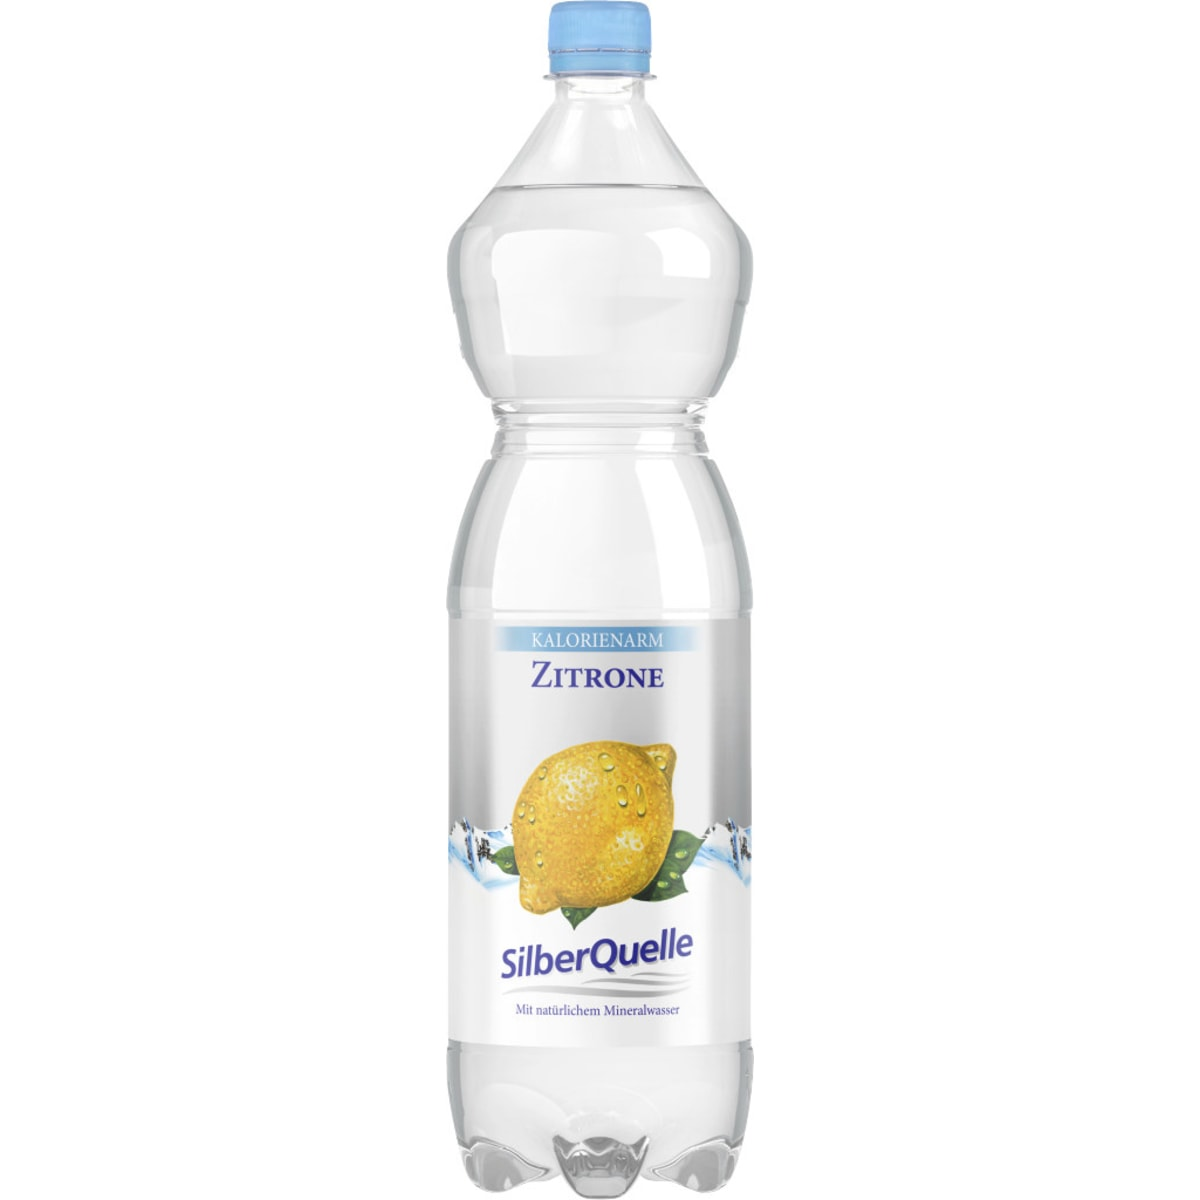 Silberquelle Zitrone Kaloriena